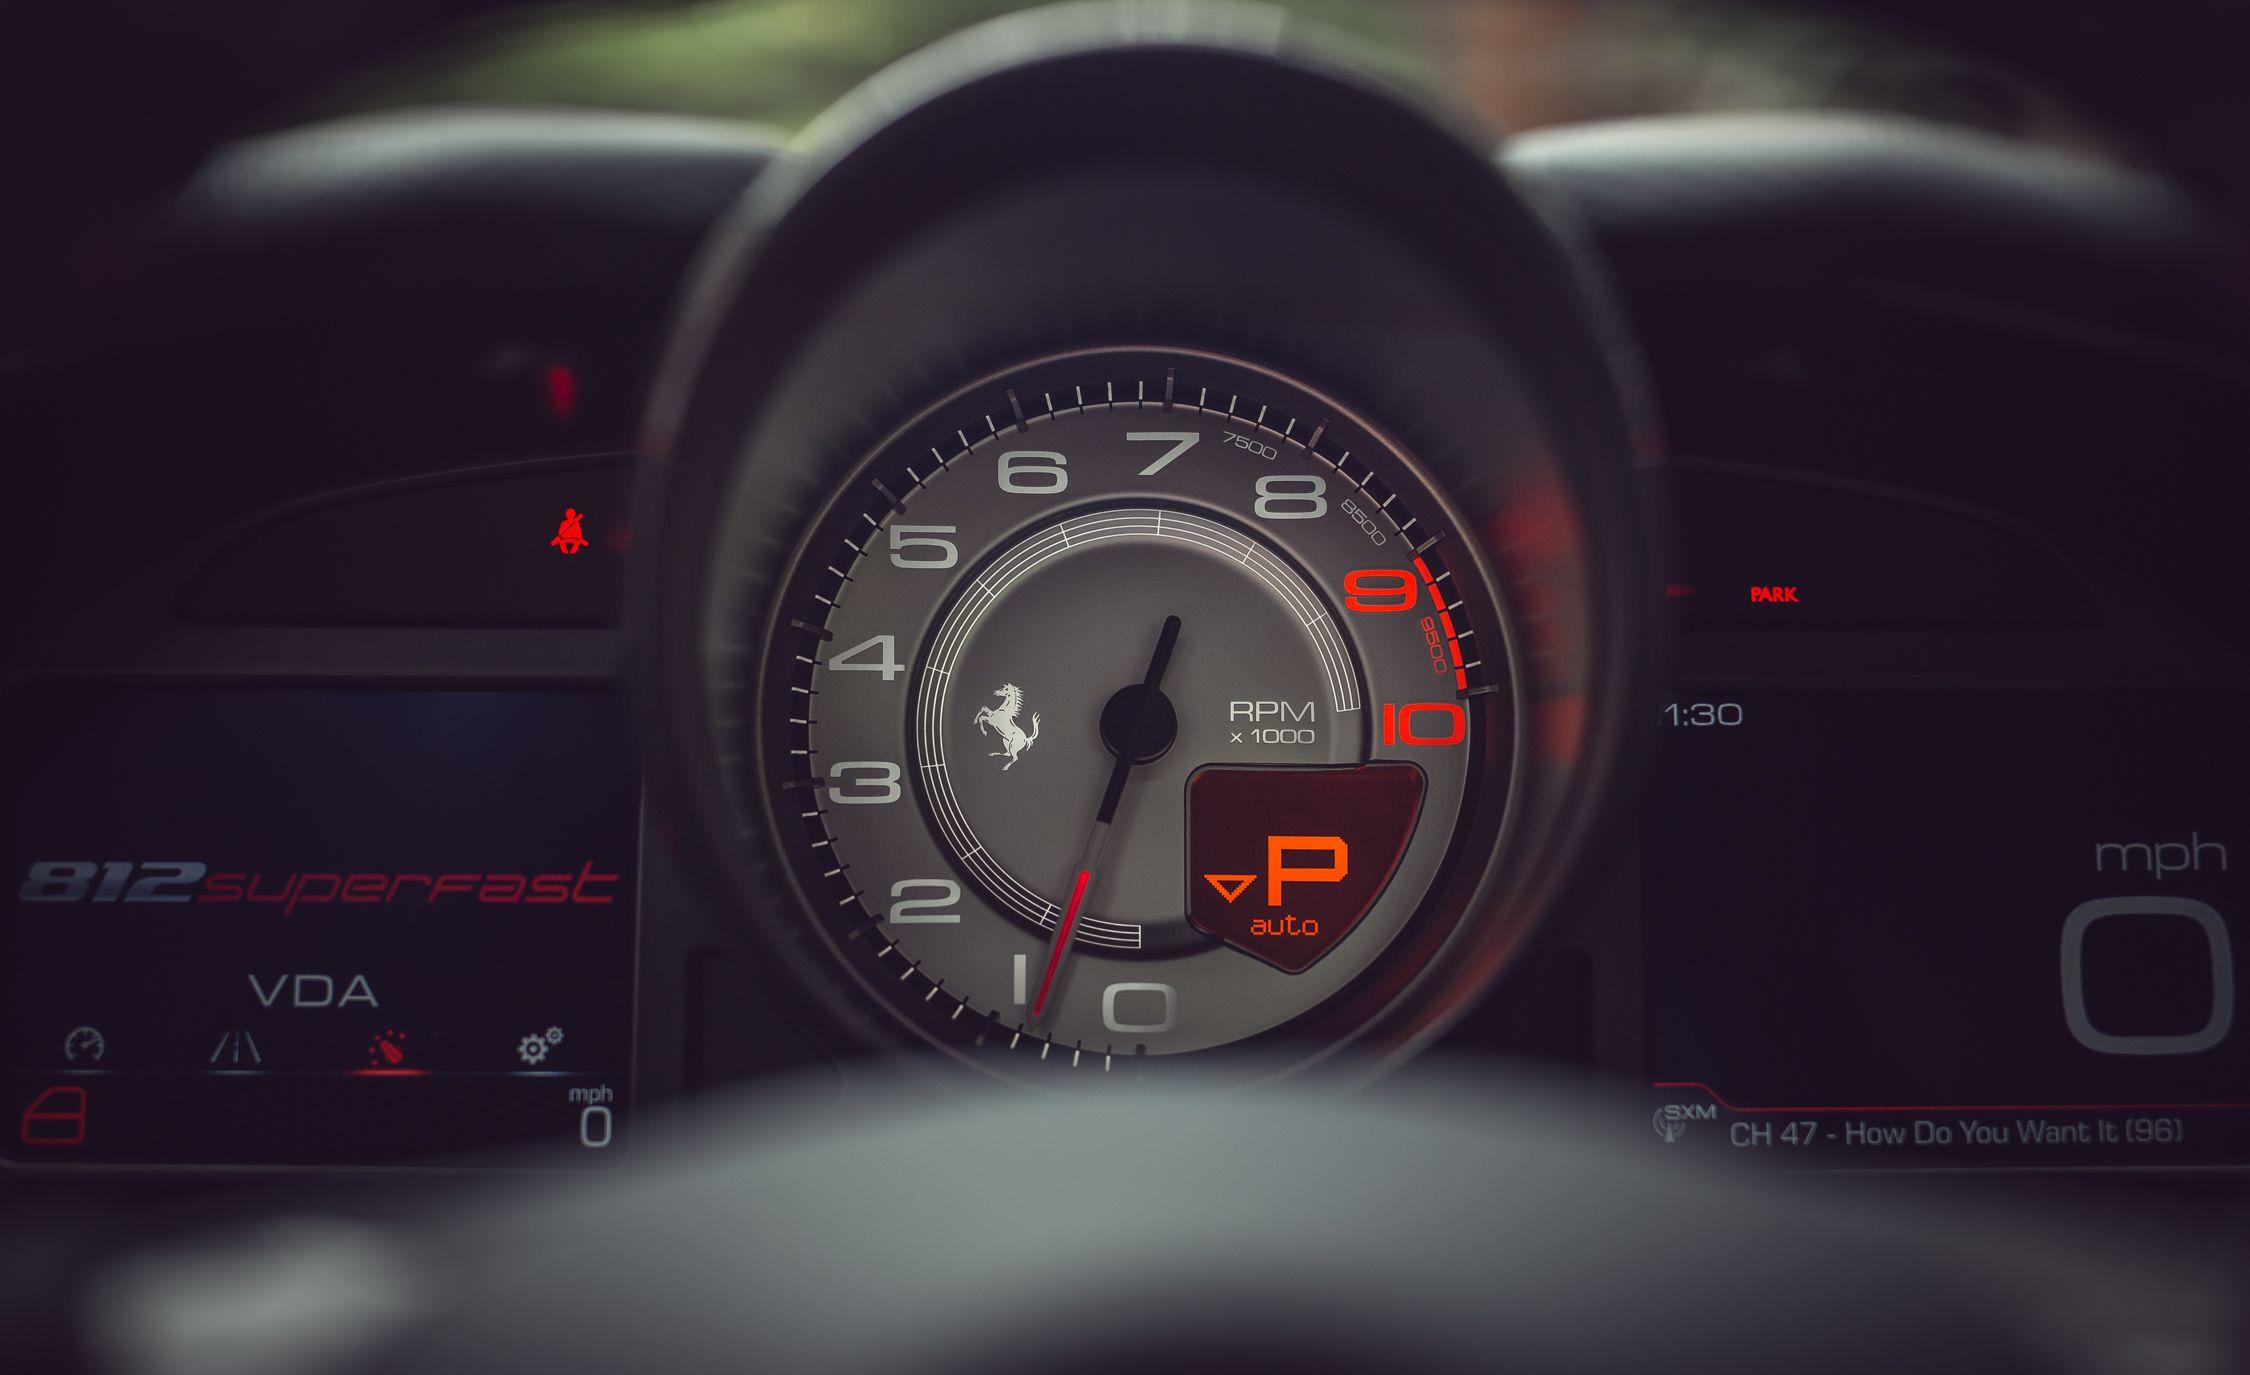 Ferrari 812 Superfast Reviews Price Photos 1 8l H 4 Subaru Engine Diagram And Specs Car Driver